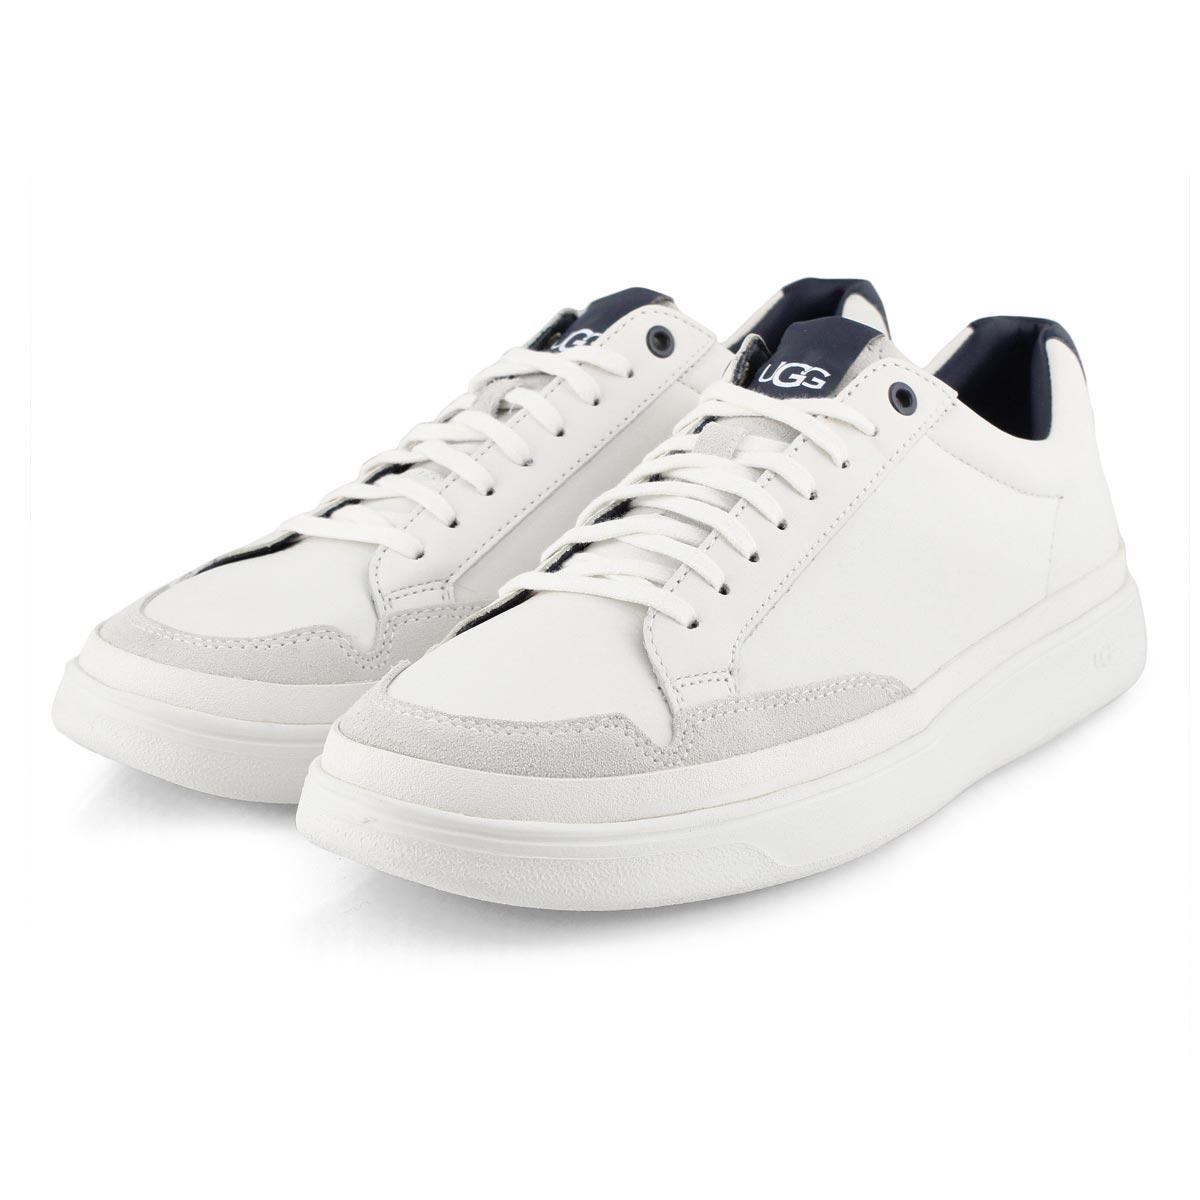 Mns South Bay white lace up sneaker